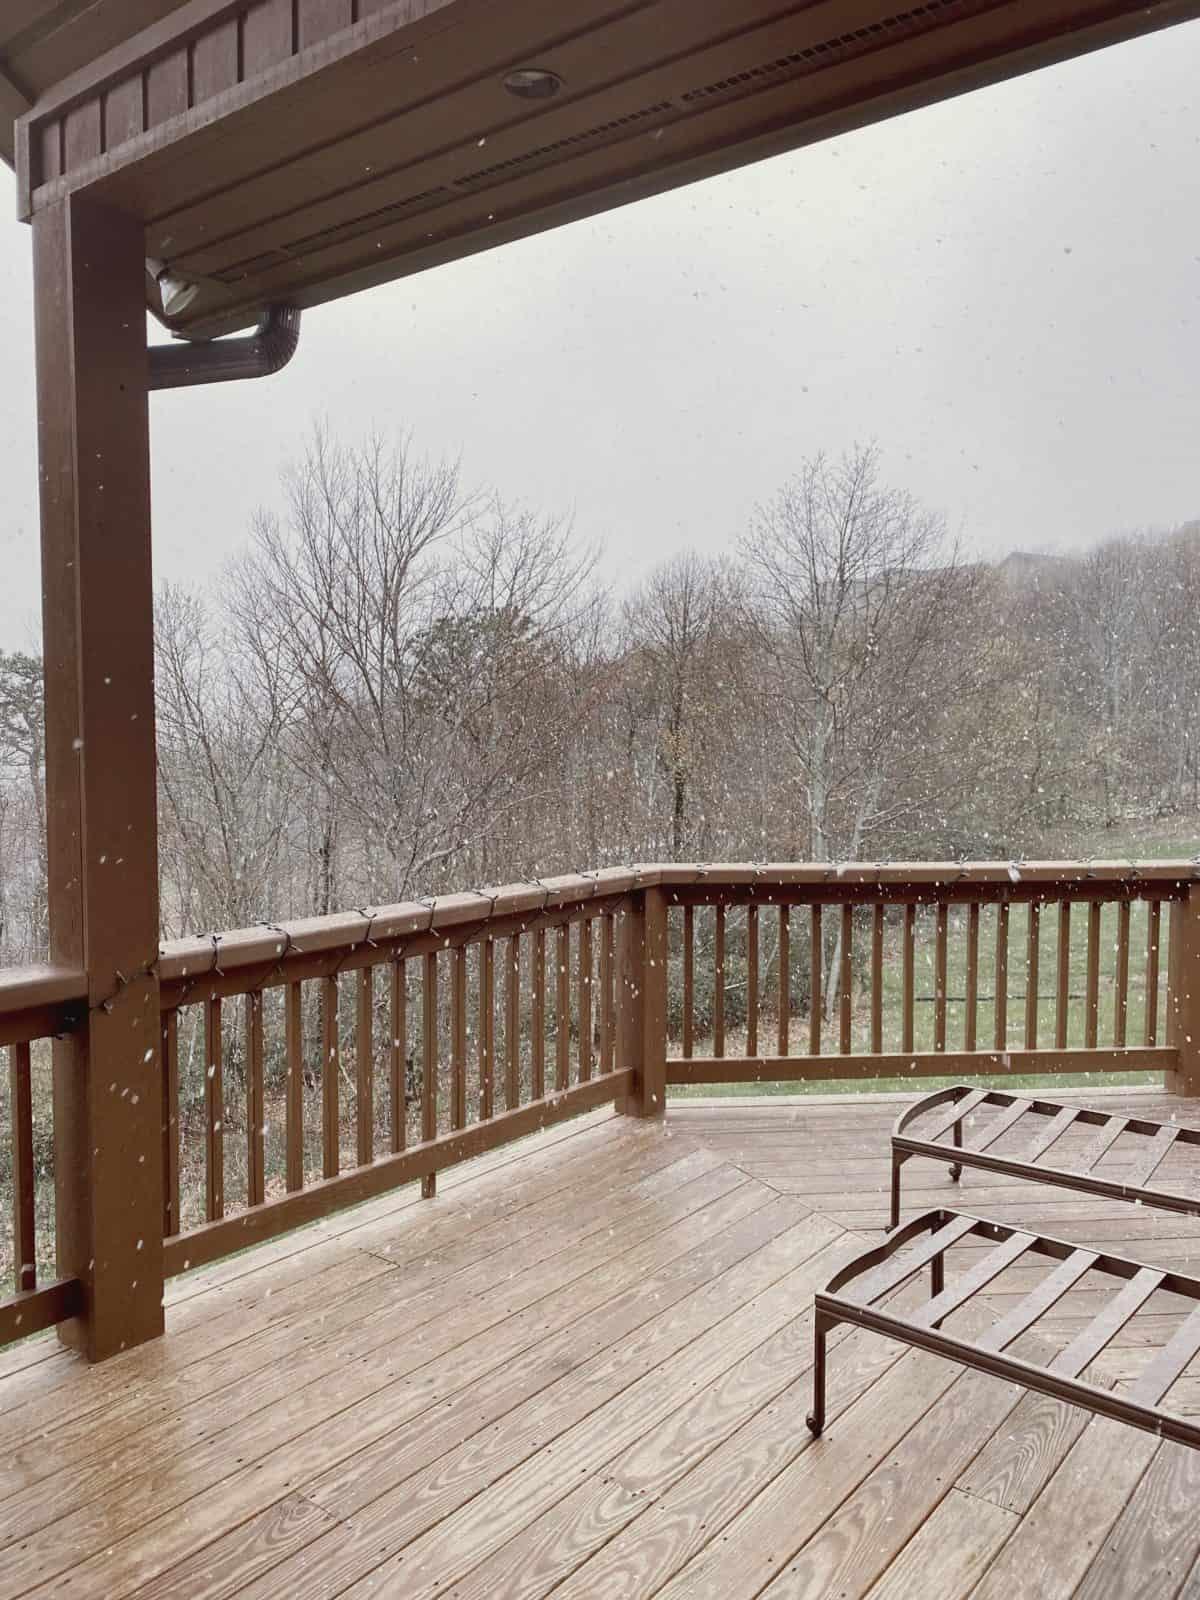 snow falling on a balcony